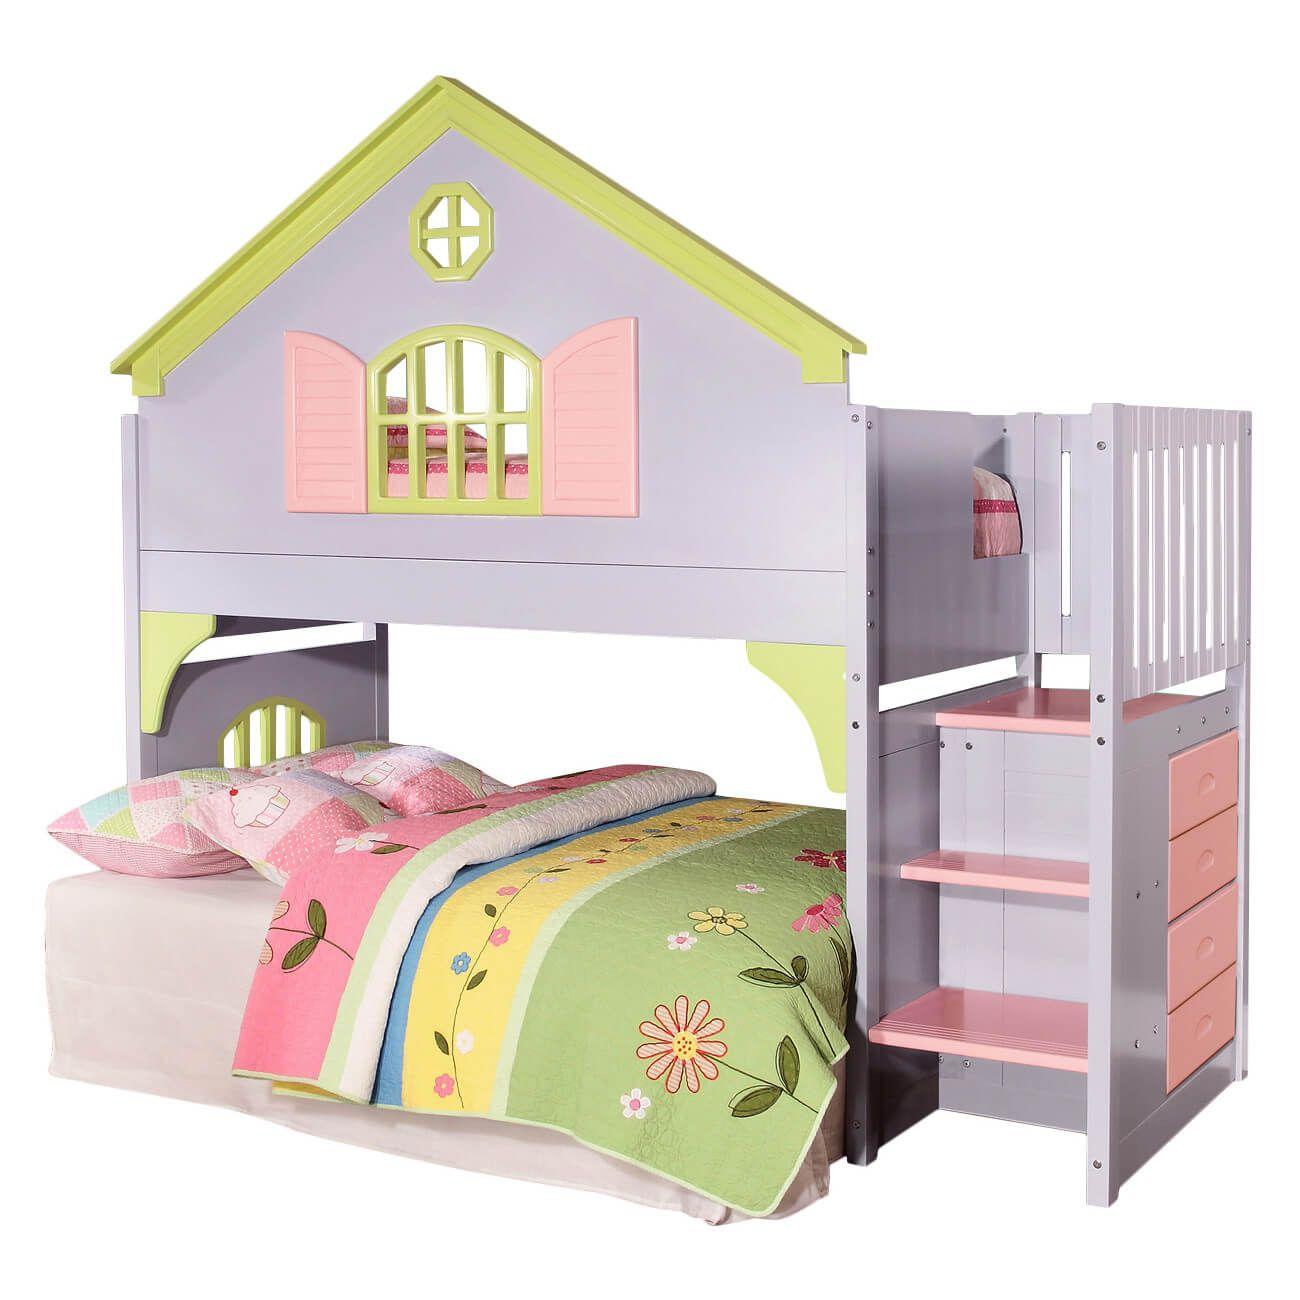 201 Fun Kids Bedroom Design Ideas for 2018